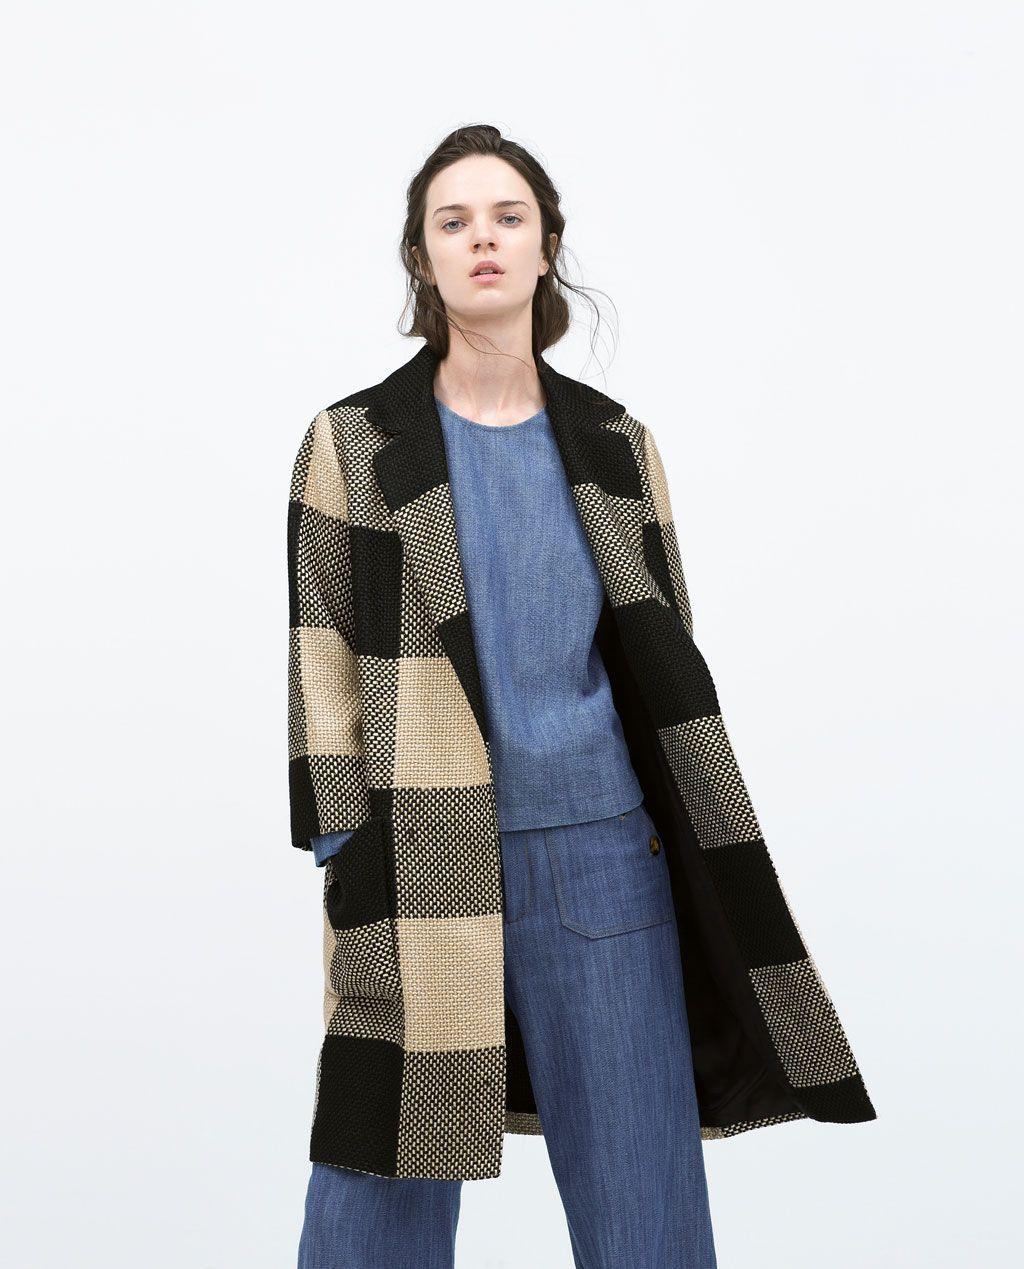 Damen ReversI Karomantel Fashion Mit ❤️ Zara BrdoWEQCex